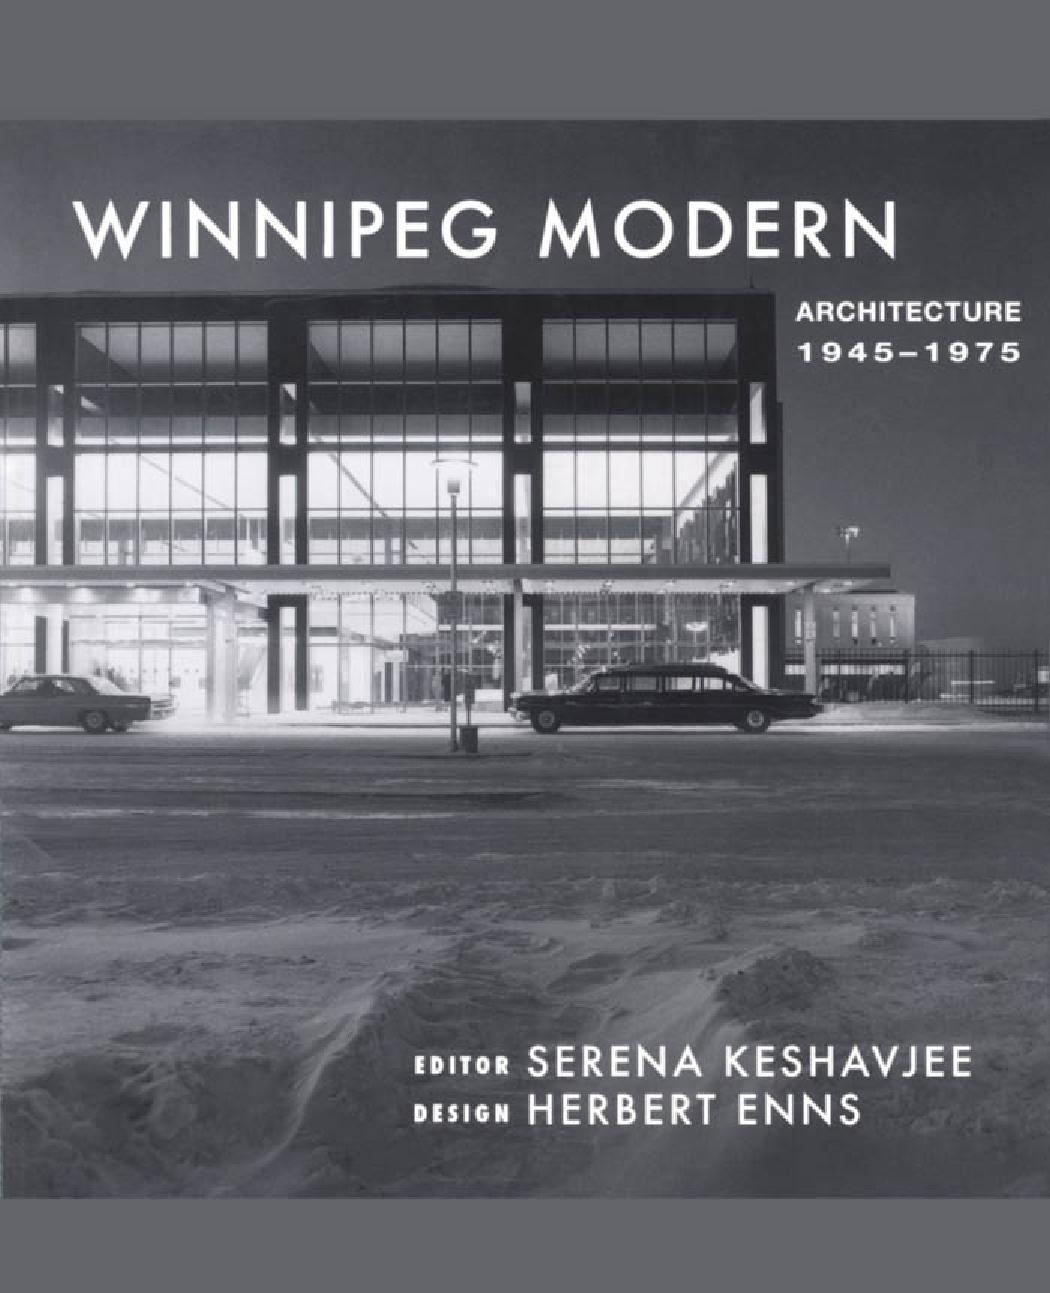 Winnipeg modern architecture 1945 to 1975 art ebook by art sf winnipeg modern architecture 1945 to 1975 art ebook by art sf blog issuu fandeluxe Gallery